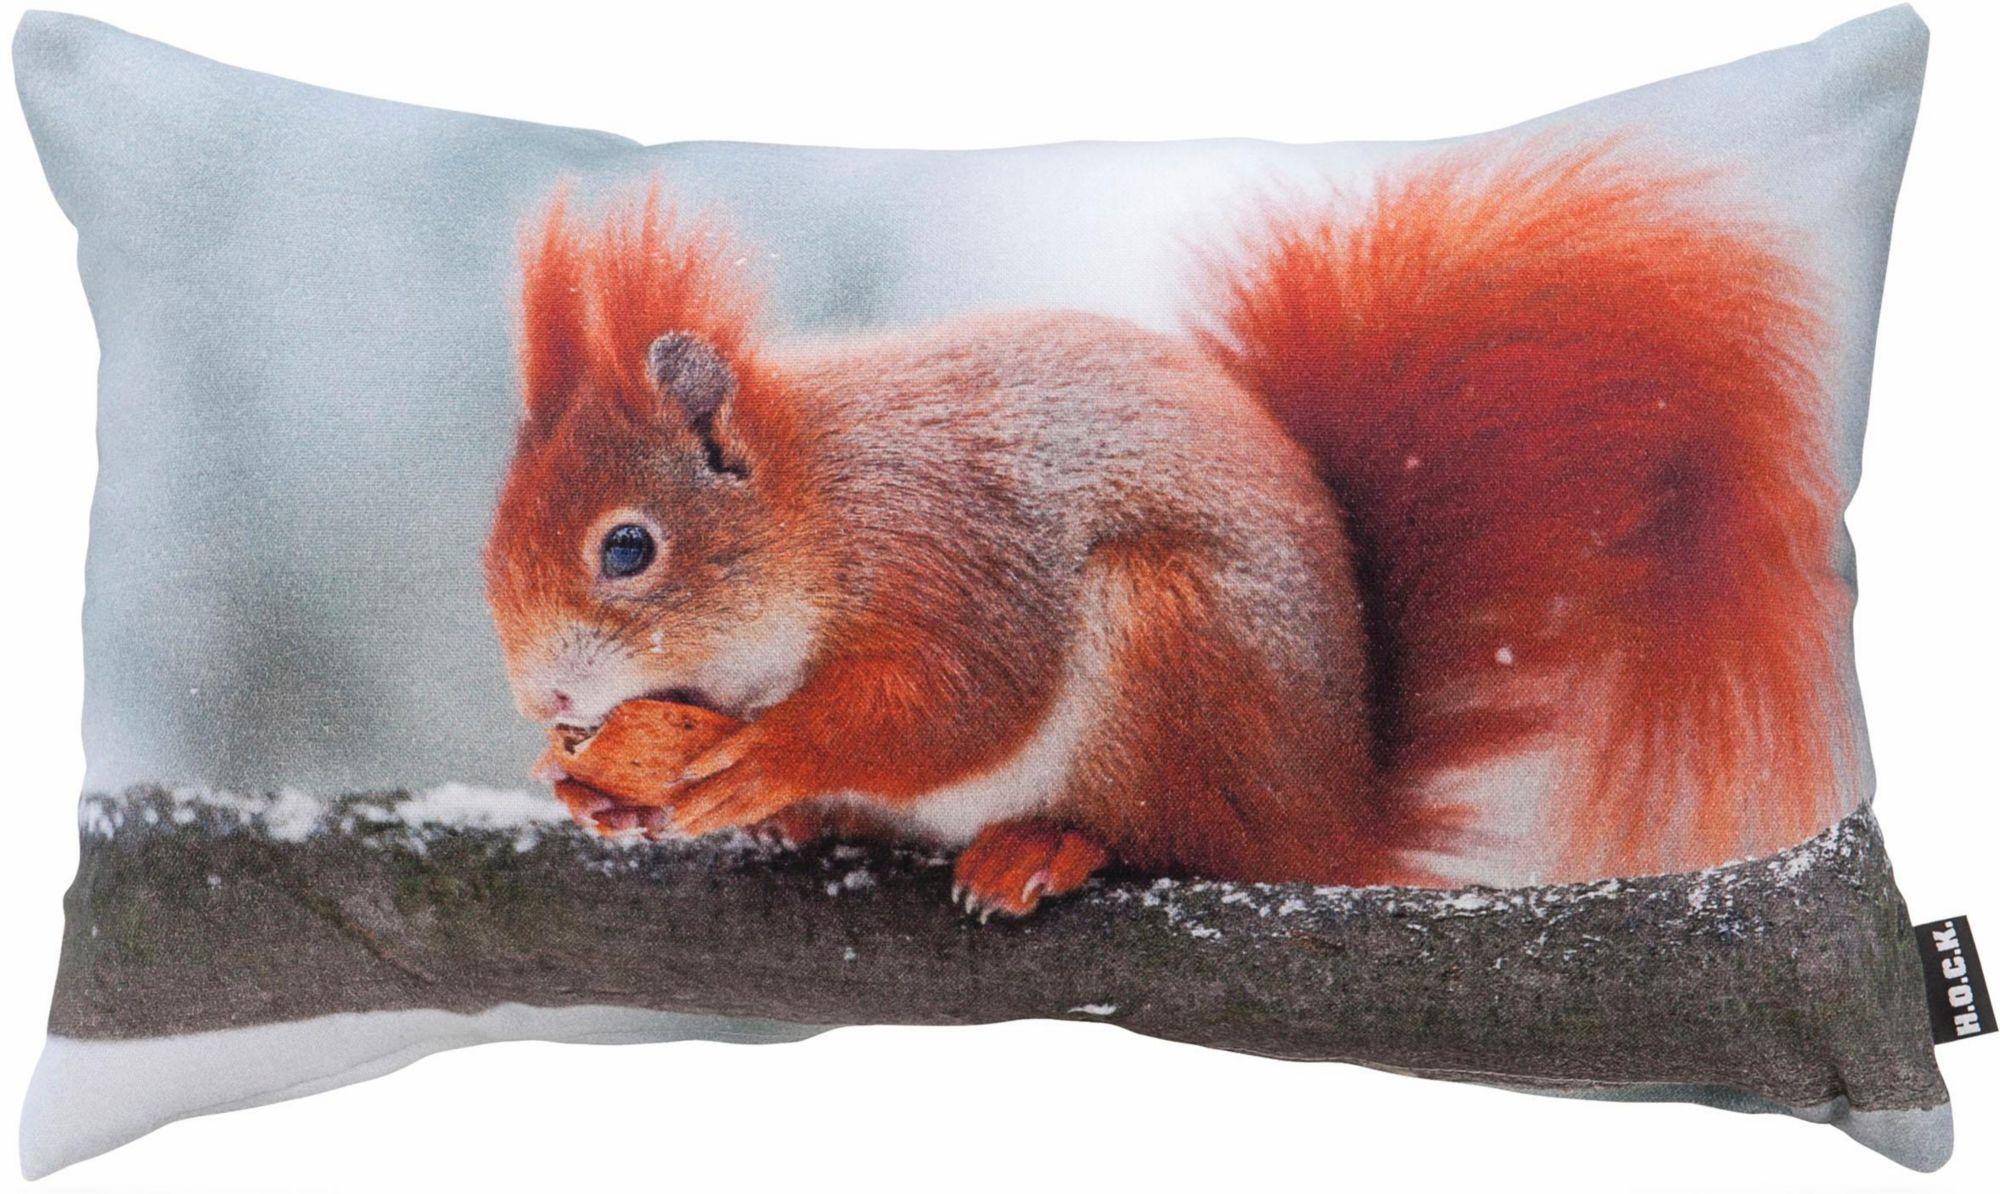 HOCK Hock Kissen mit Eichhörnchenmotiv